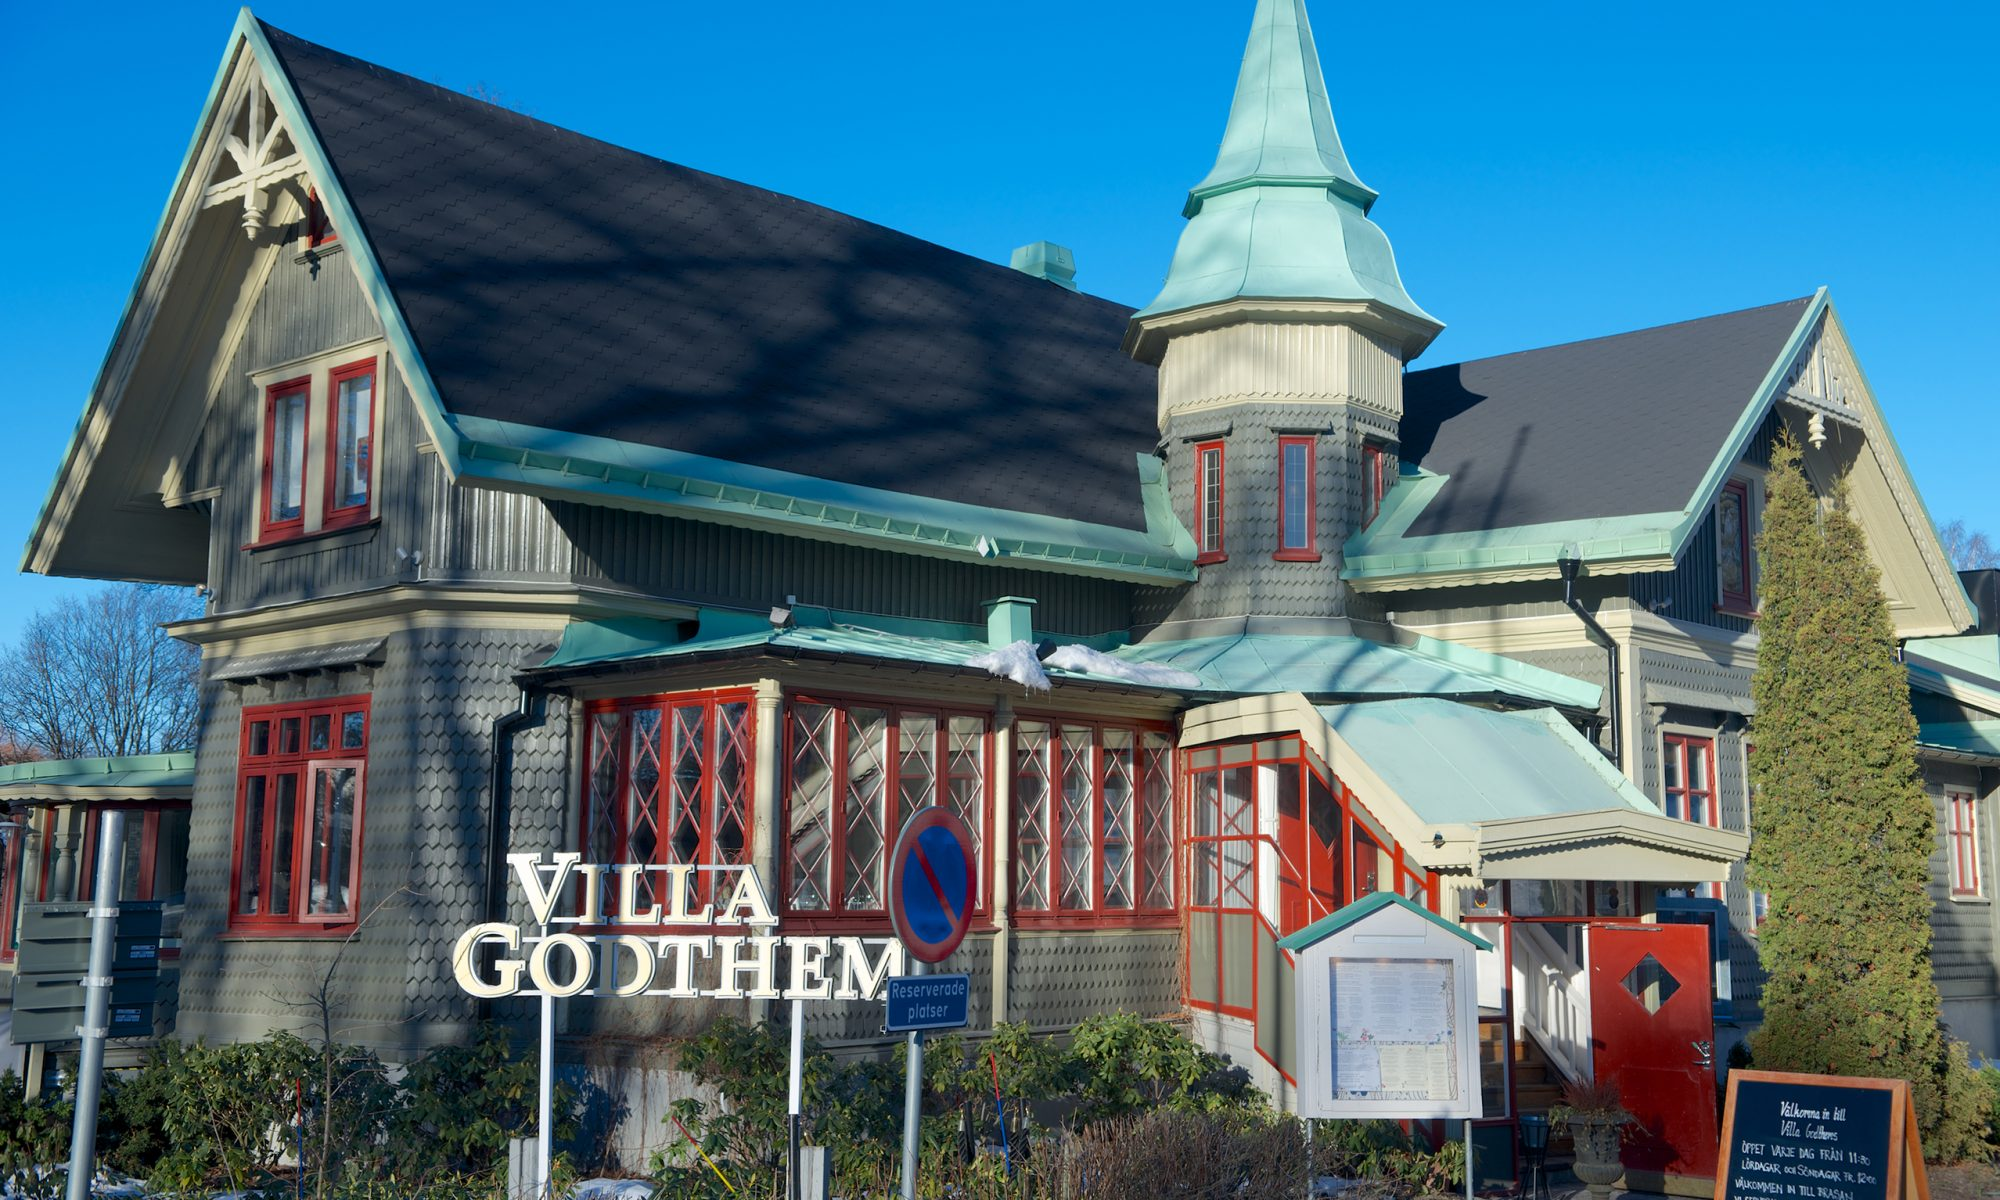 Villa Godthem